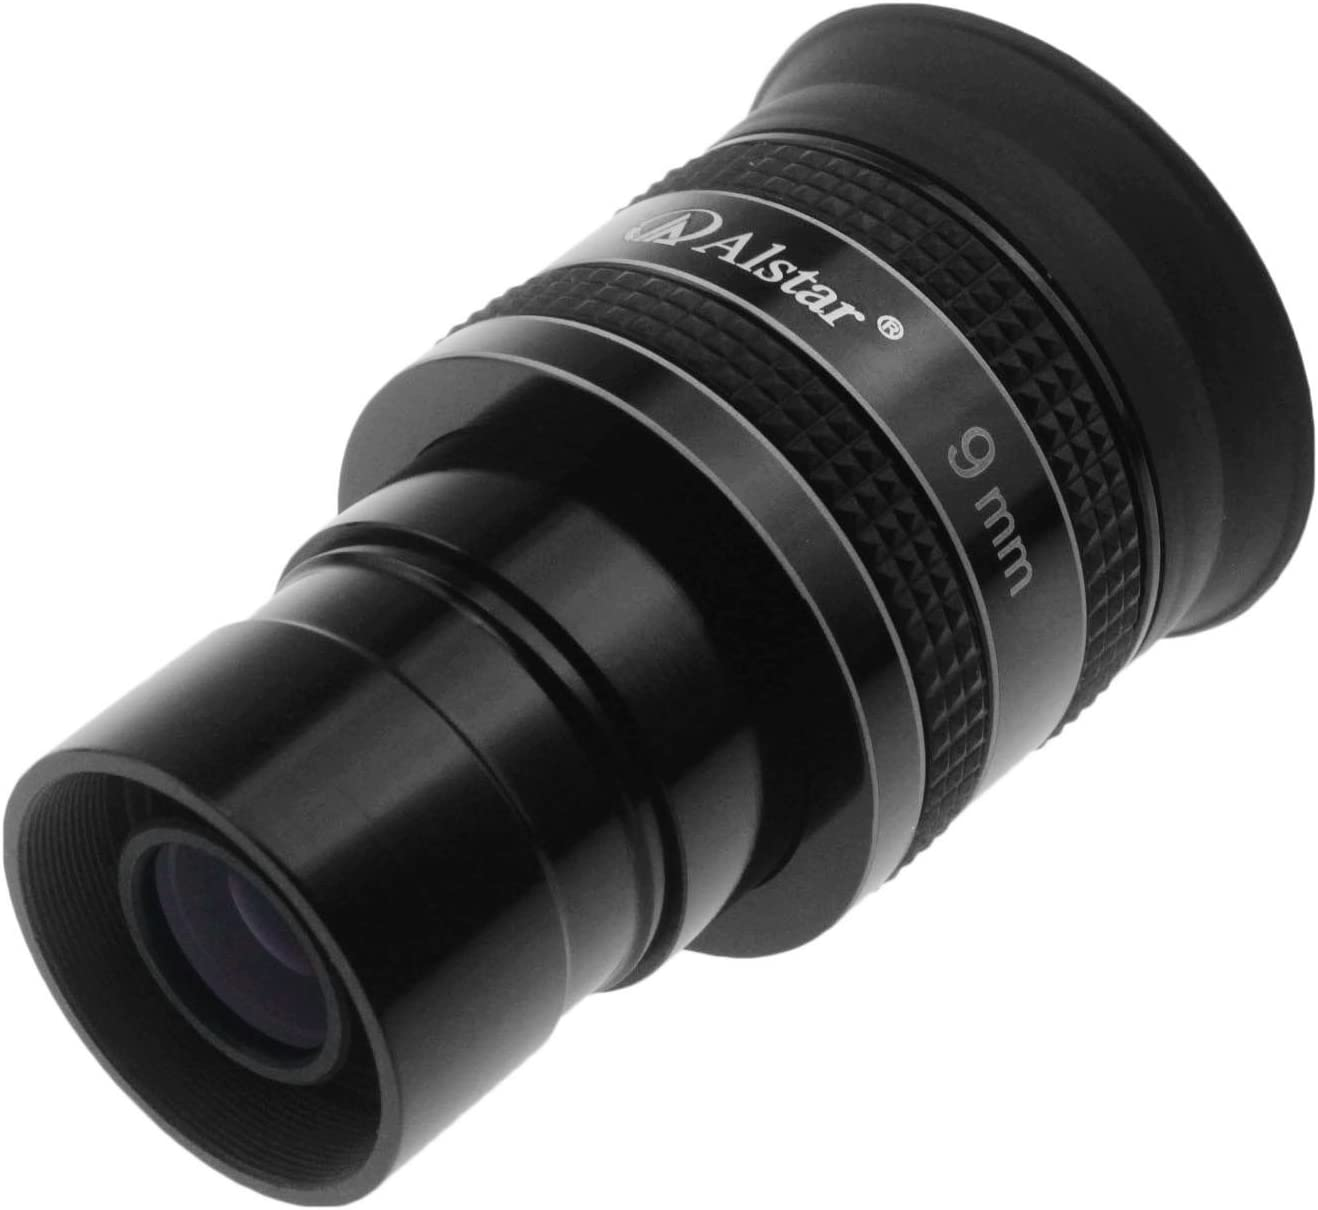 Alstar 1.25 9mm 58-Degree Planetary Eyepiece For Telescope